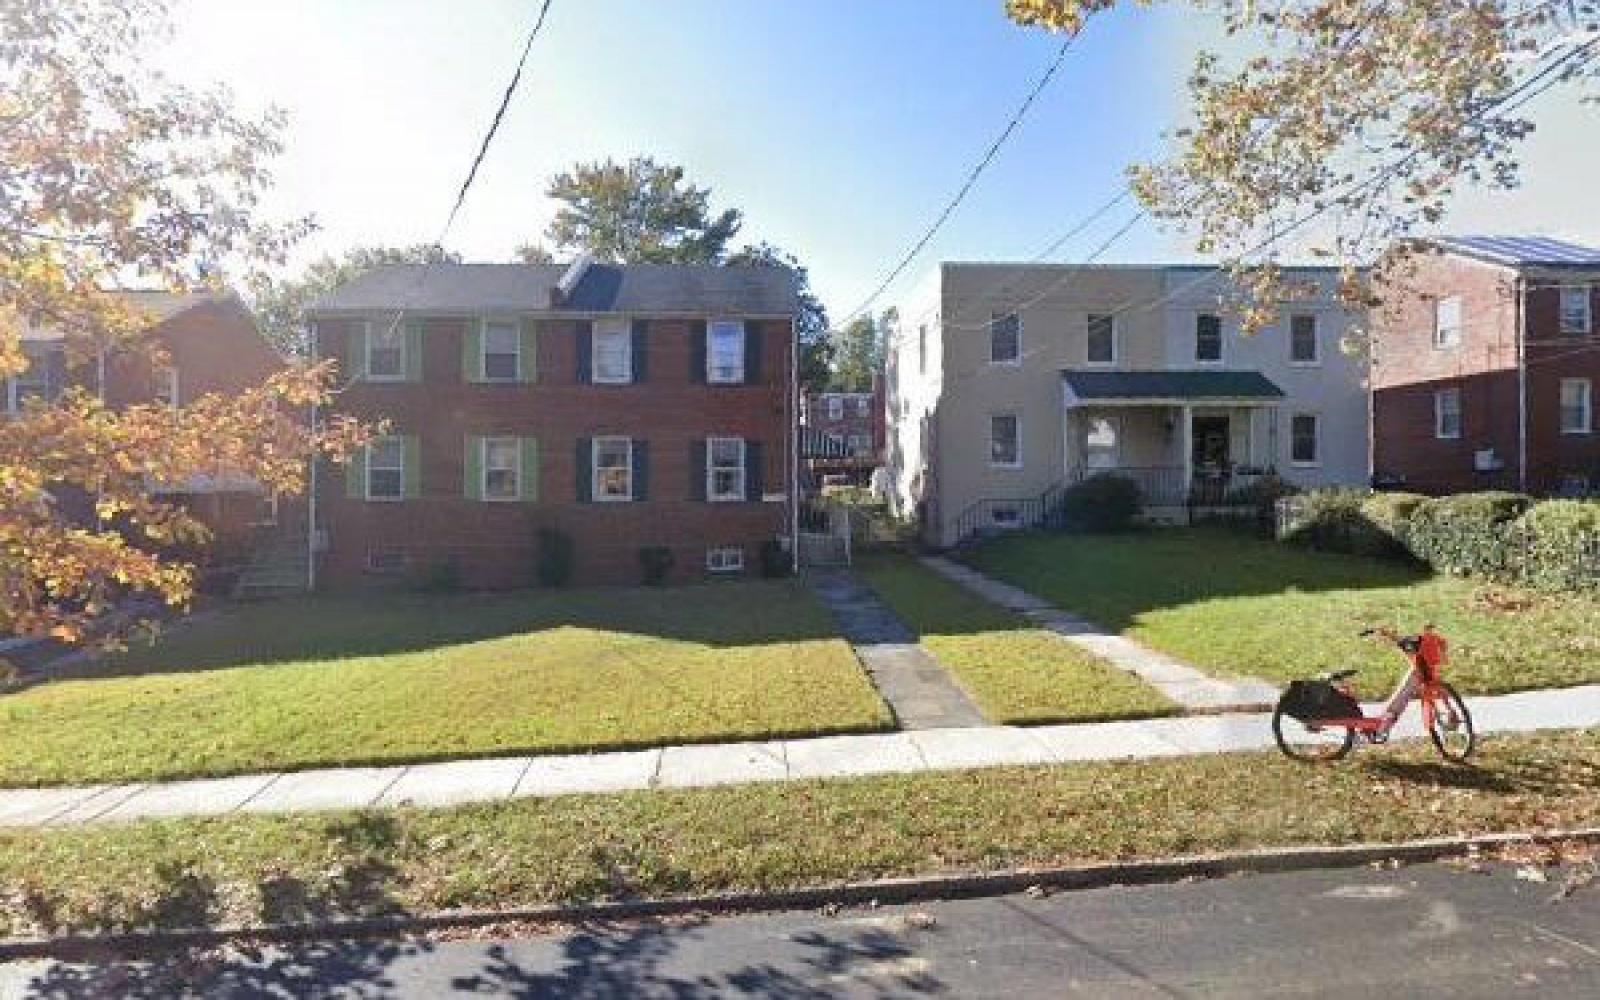 5030 12th St NE,Washington,District Of Columbia 20017,3 Bedrooms Bedrooms,1 BathroomBathrooms,Apartment,12th St,1100